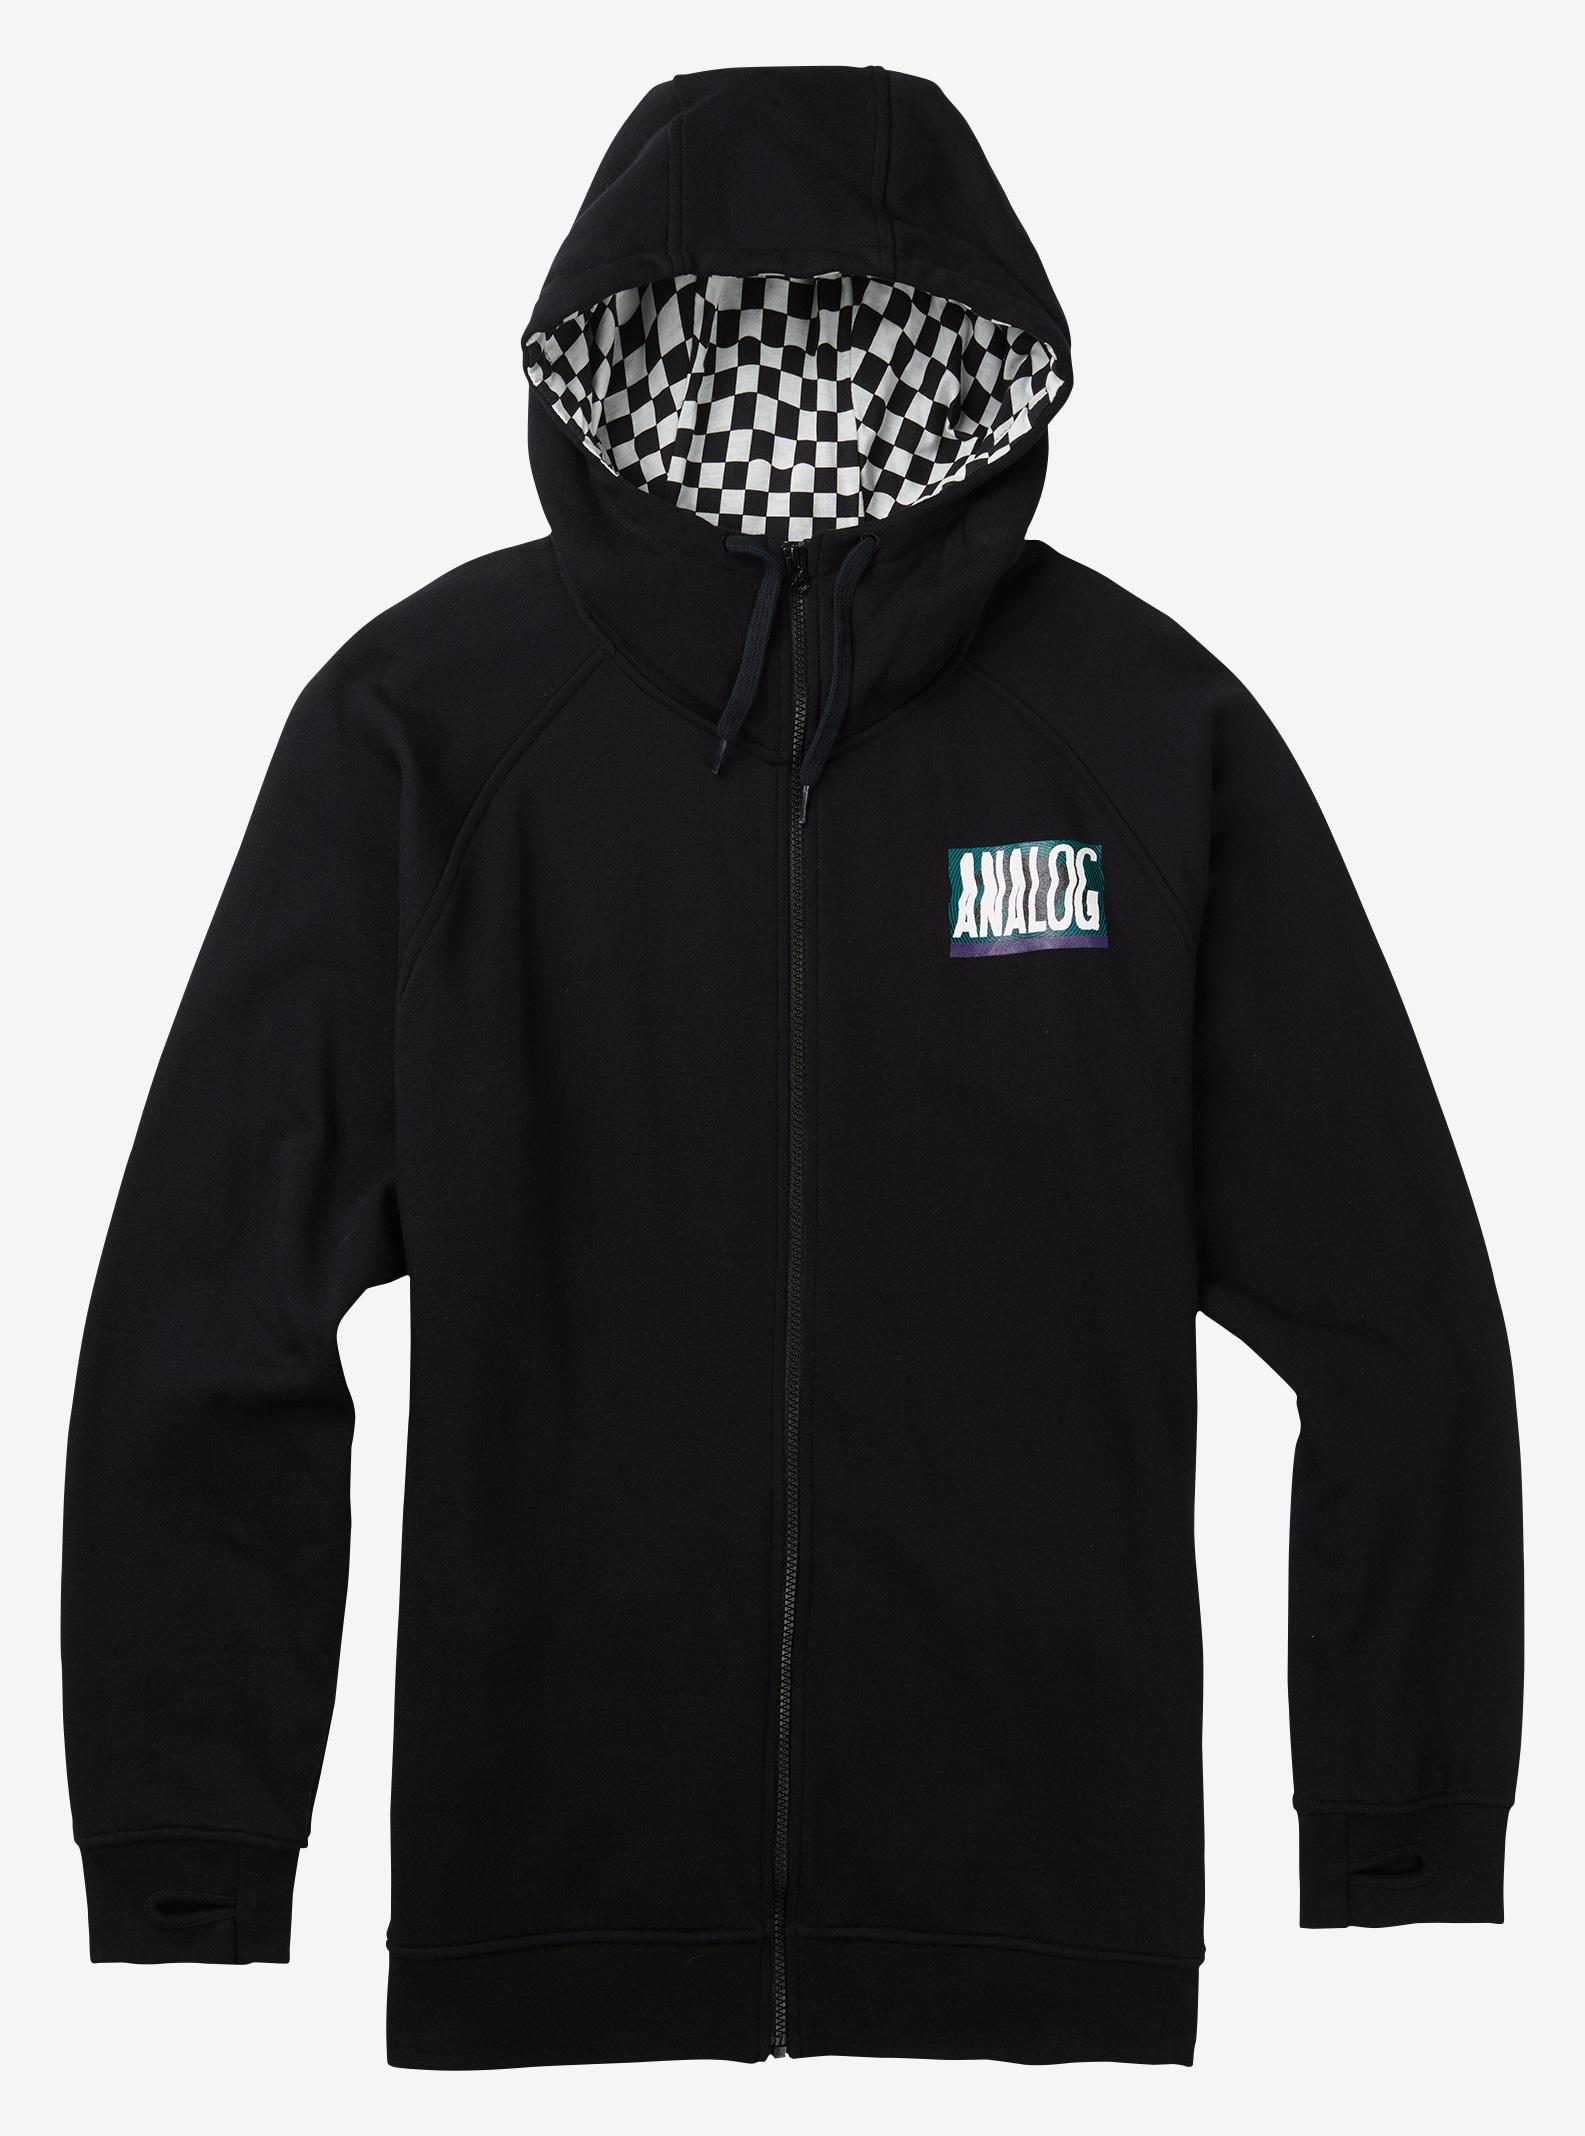 Men's Analog Bergen Full-Zip Hoodie shown in True Black